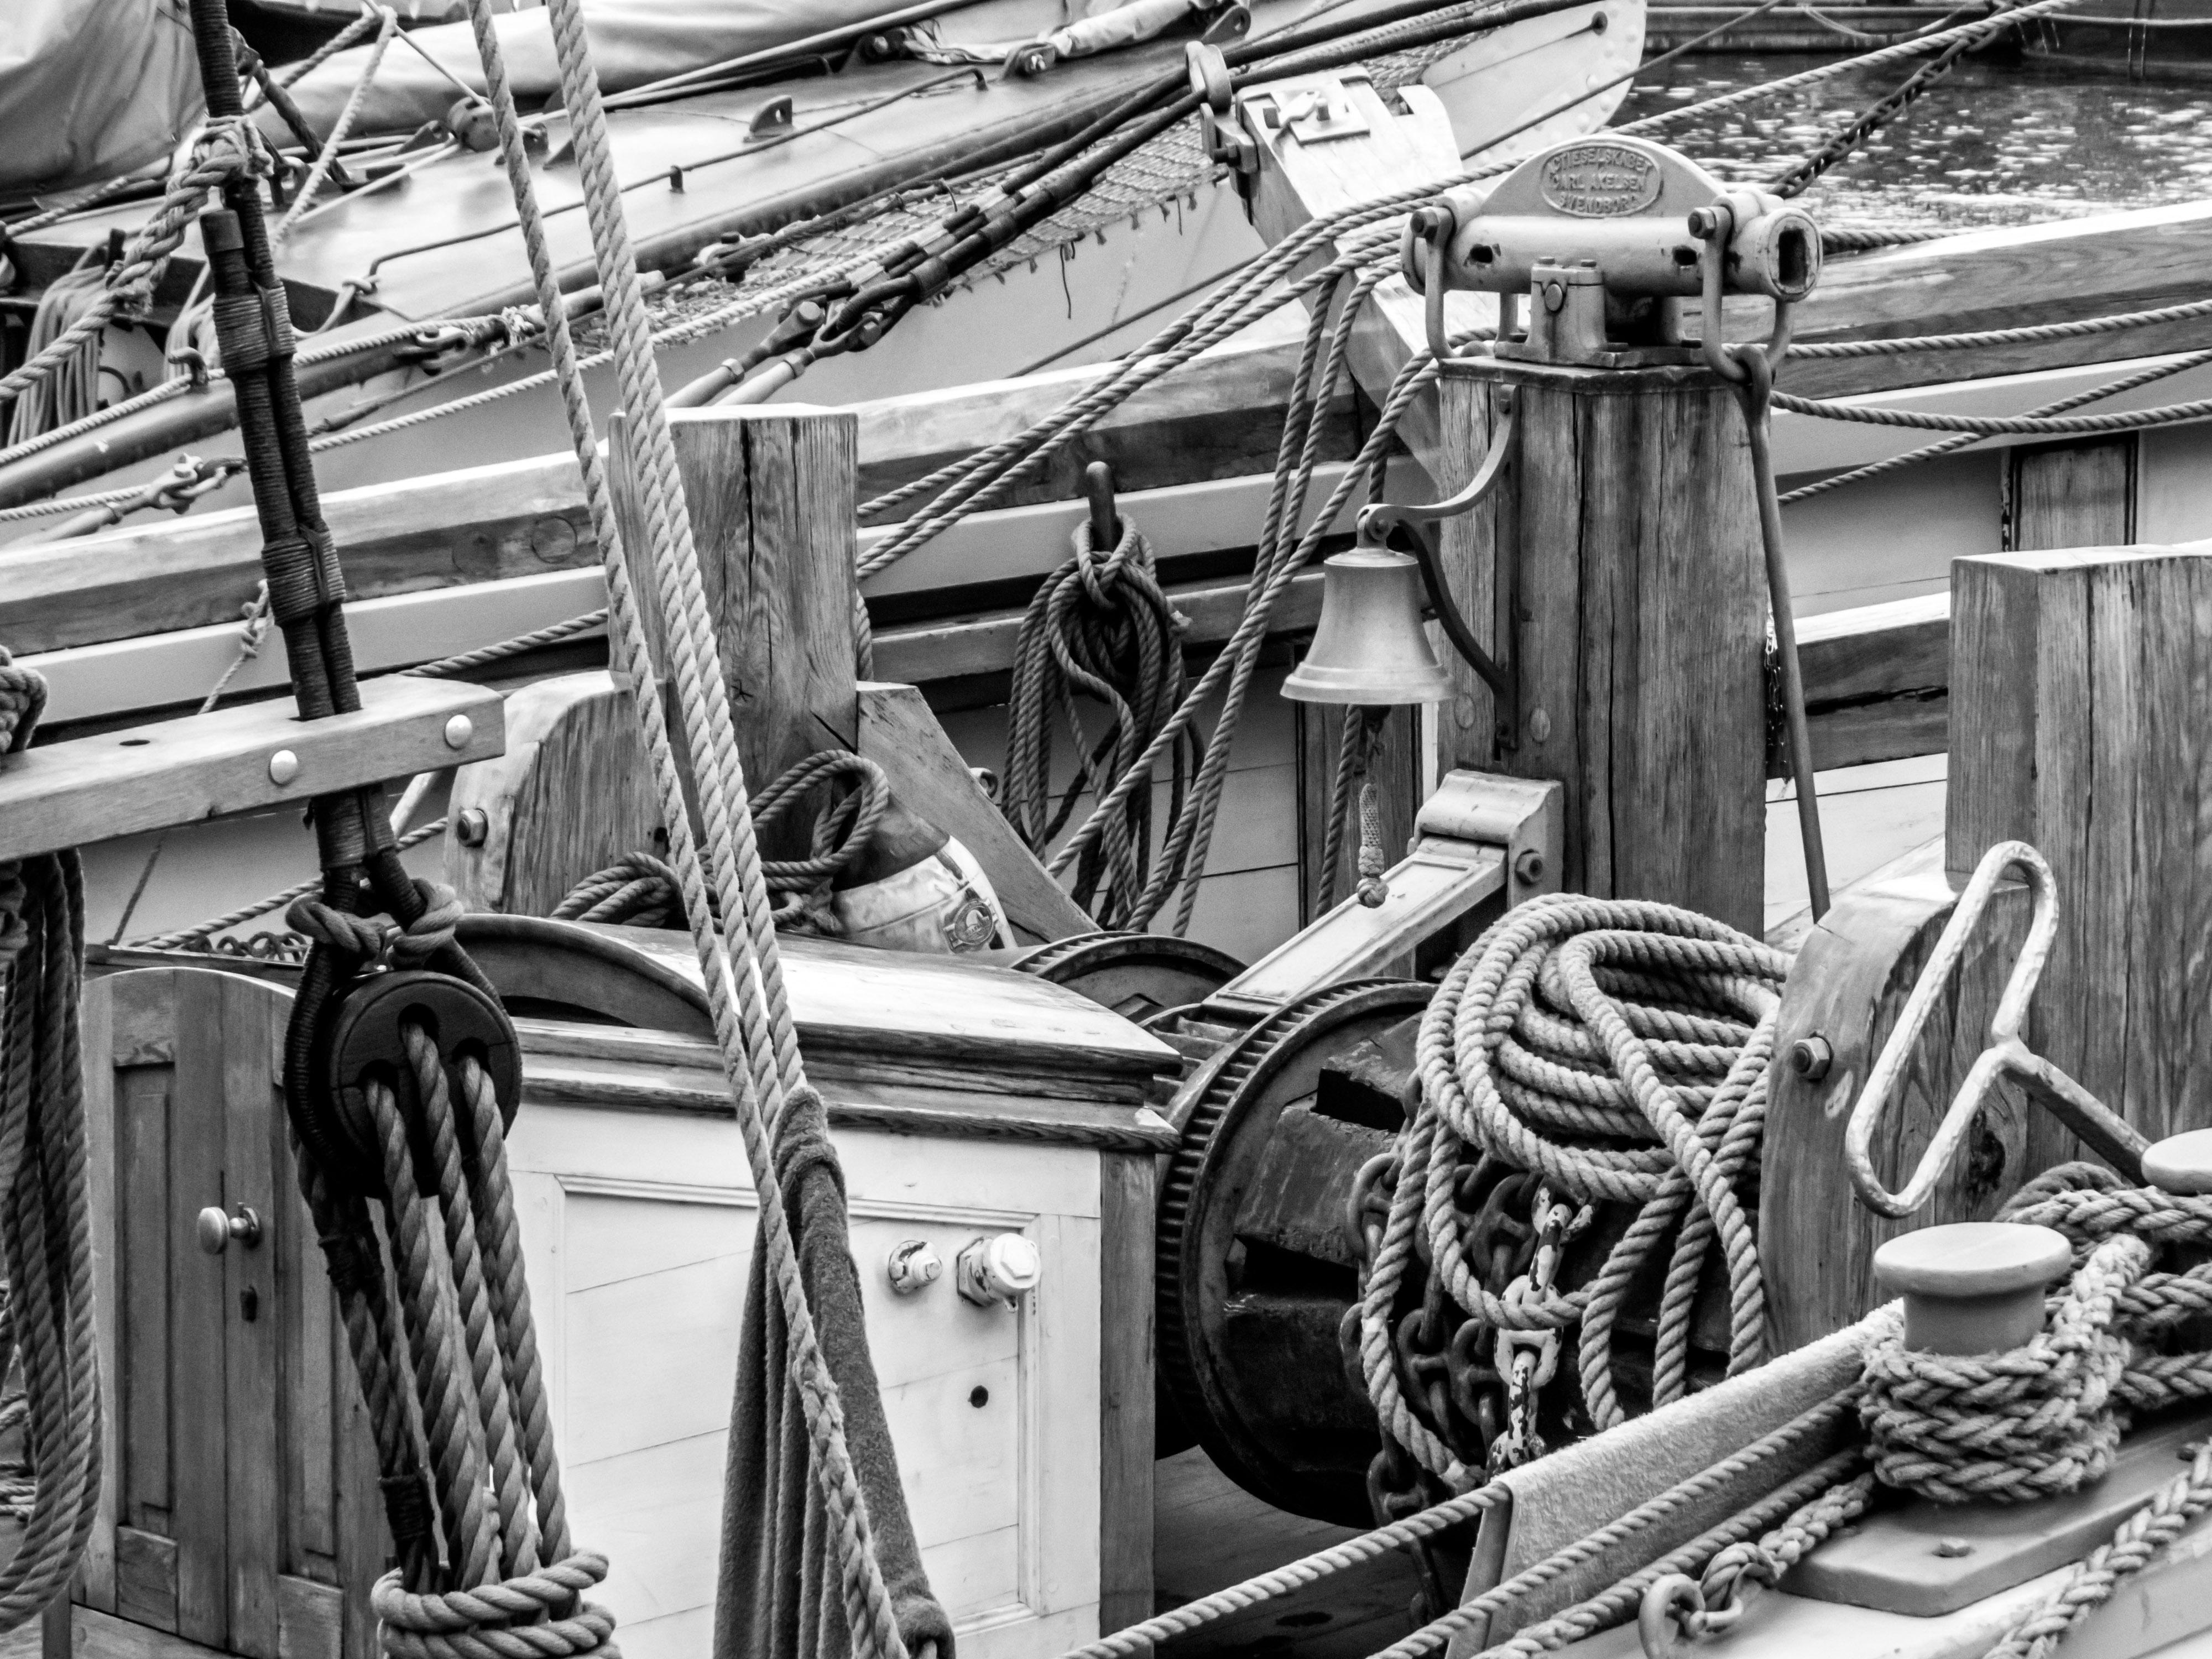 Sailing ship's winch, 2013, Sail, White, Vessel, HQ Photo